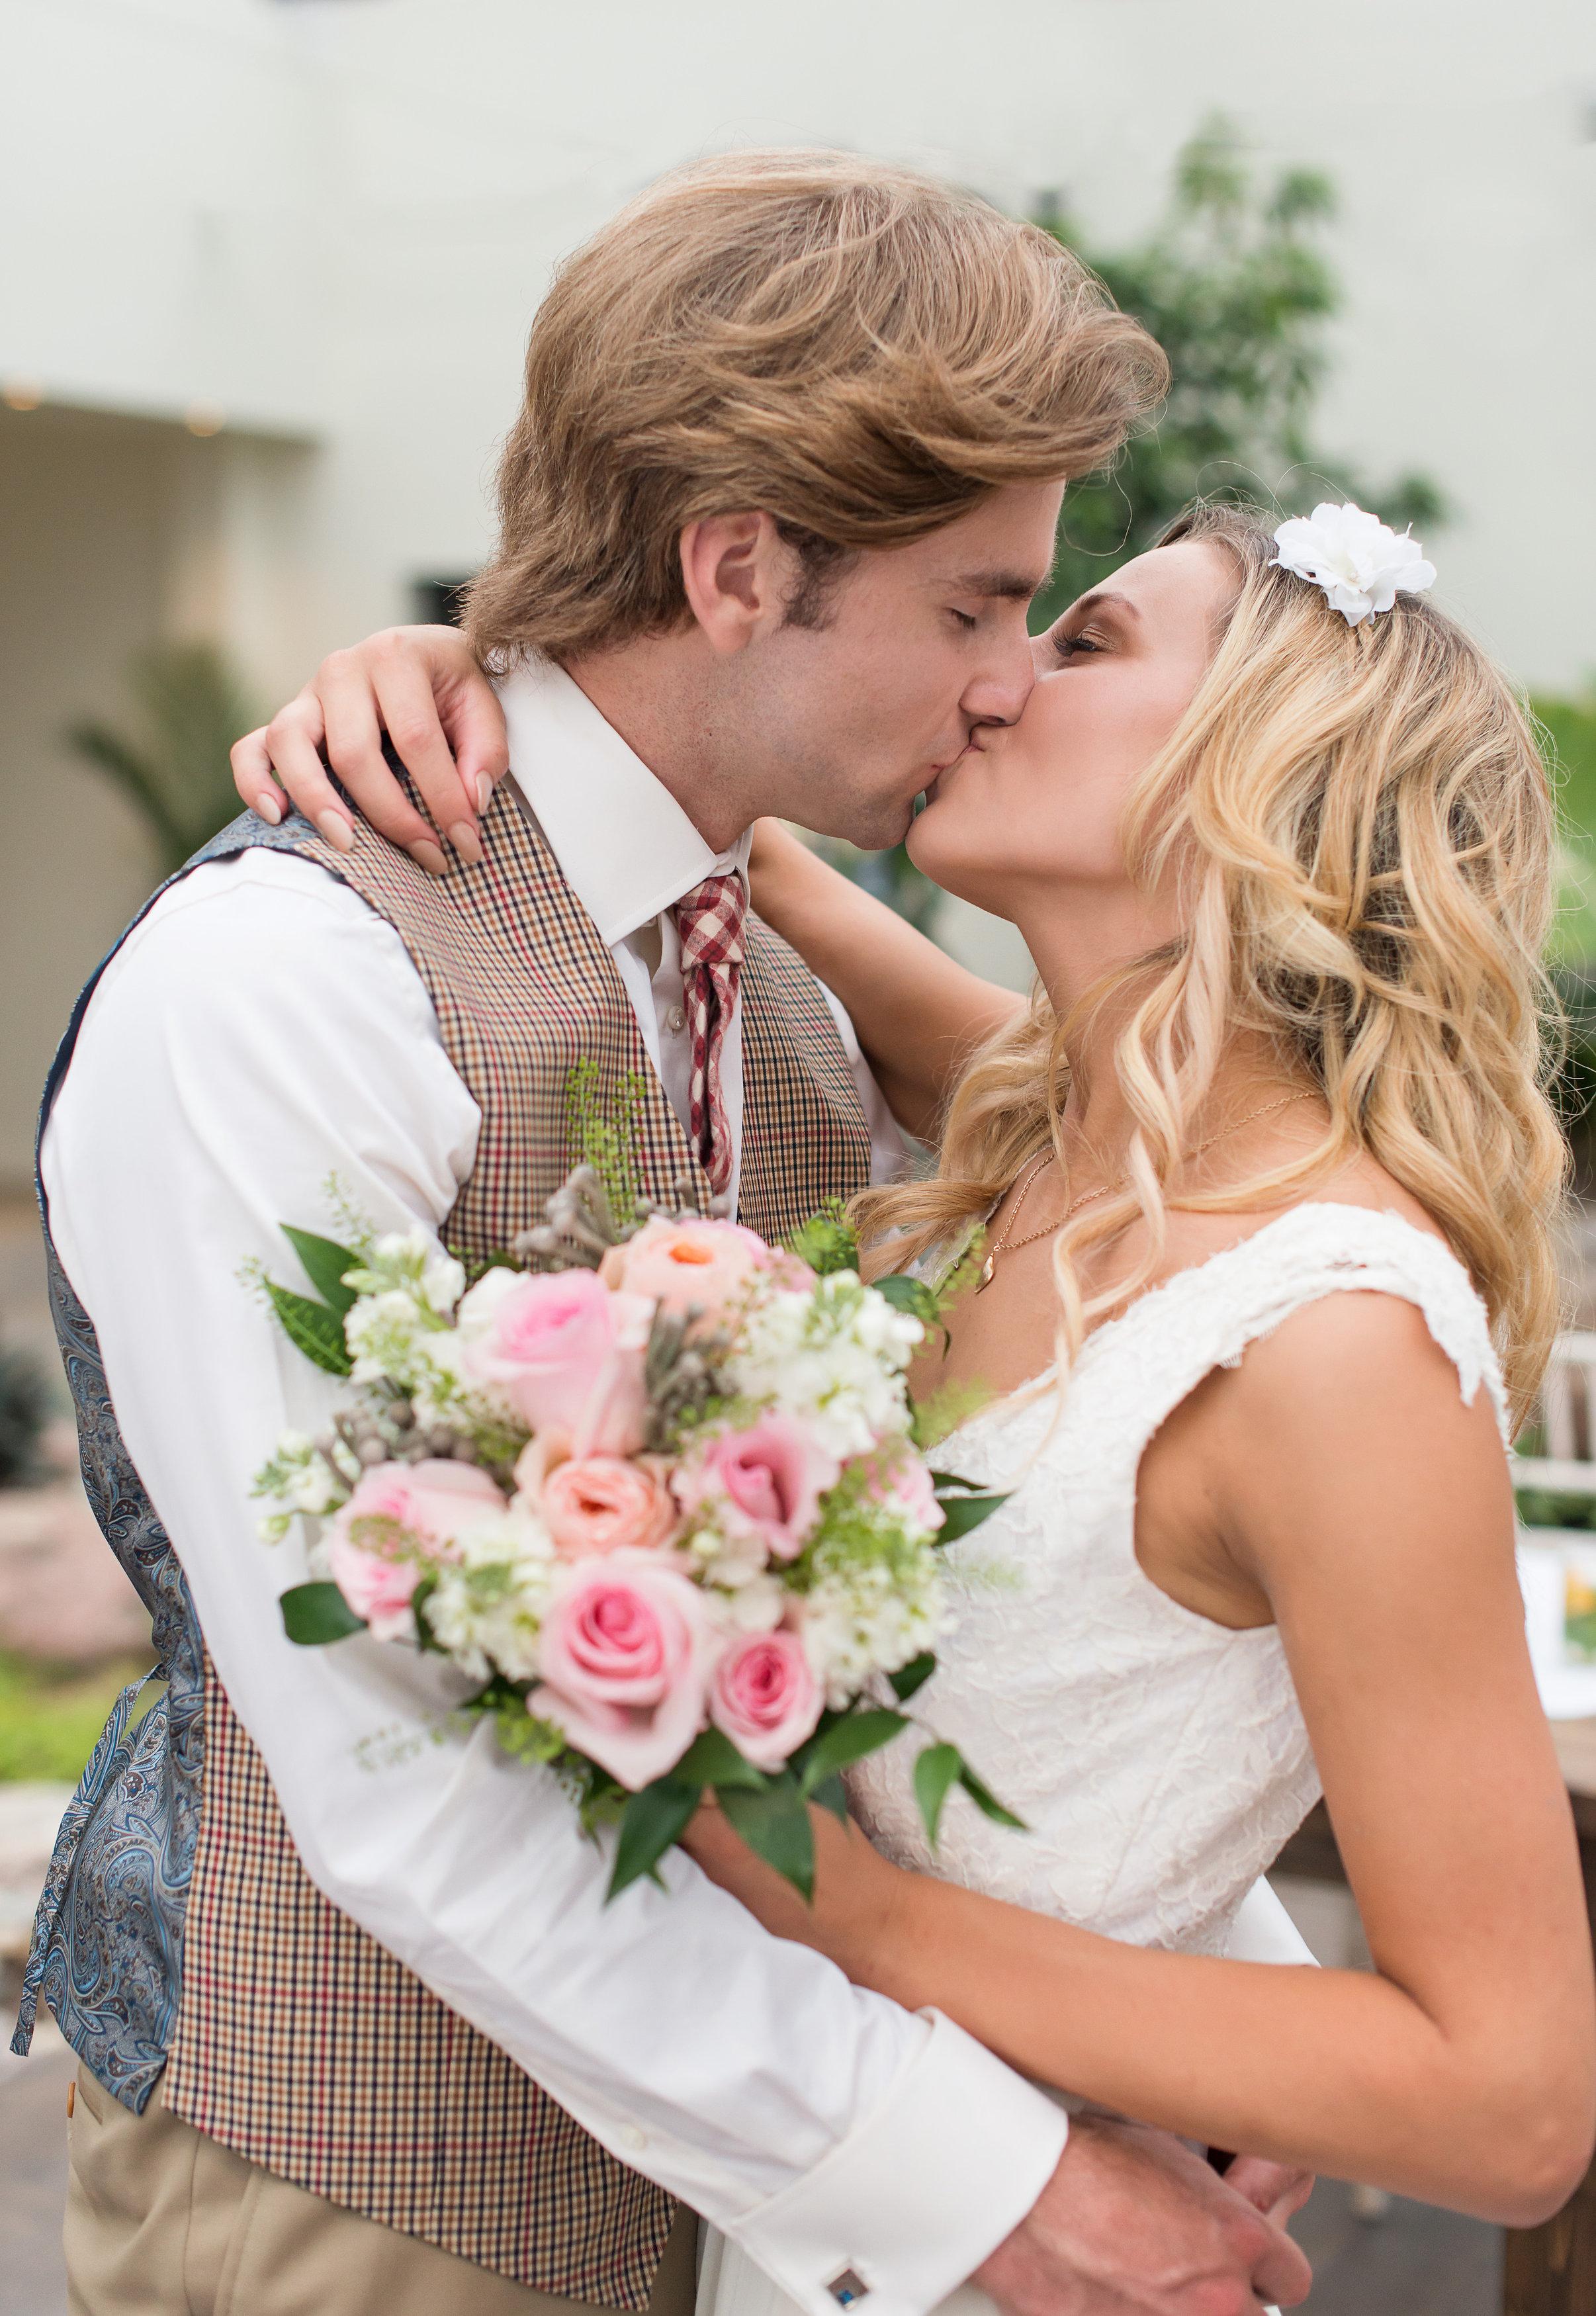 Wedding Styled Shoot at Aquatopia